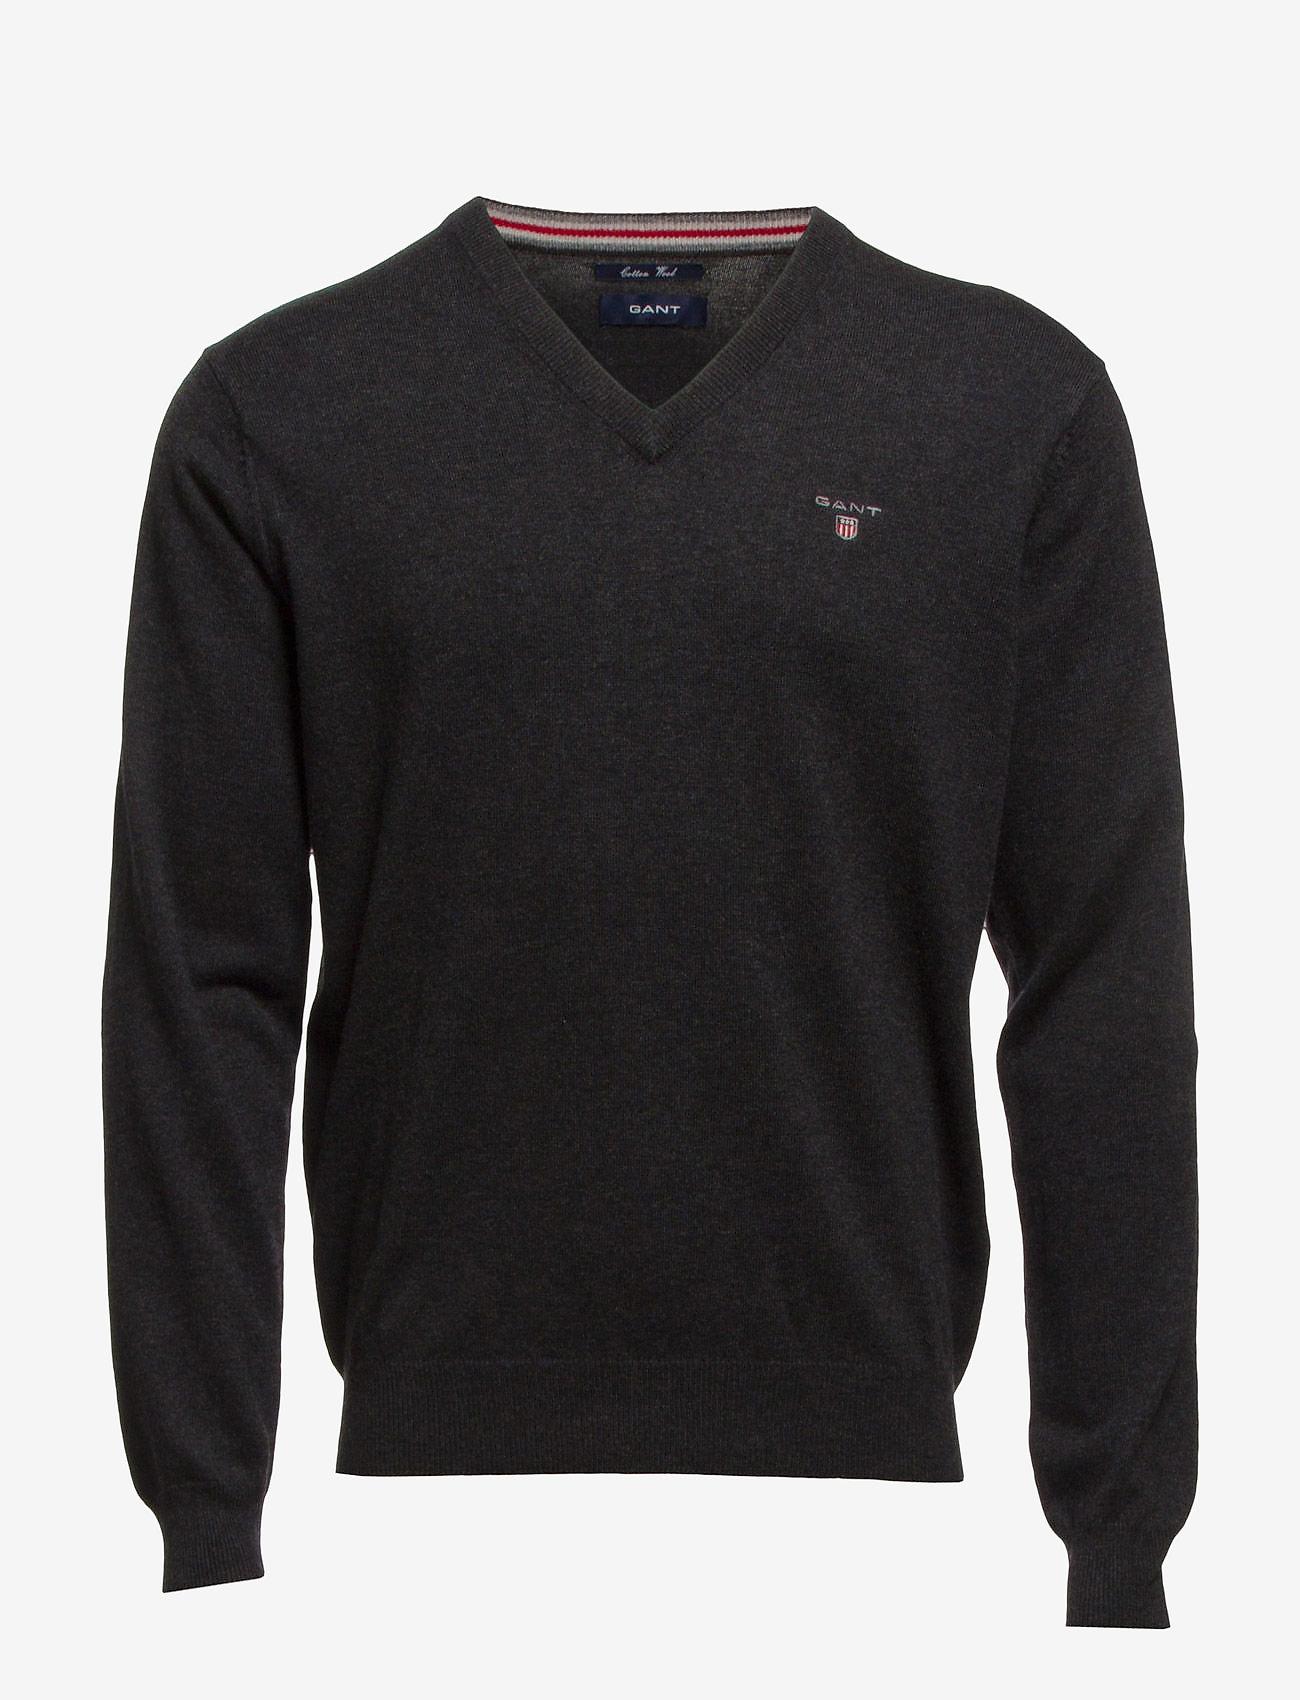 GANT - COTTON WOOL V-NECK - knitted v-necks - dk charcoal melange - 0